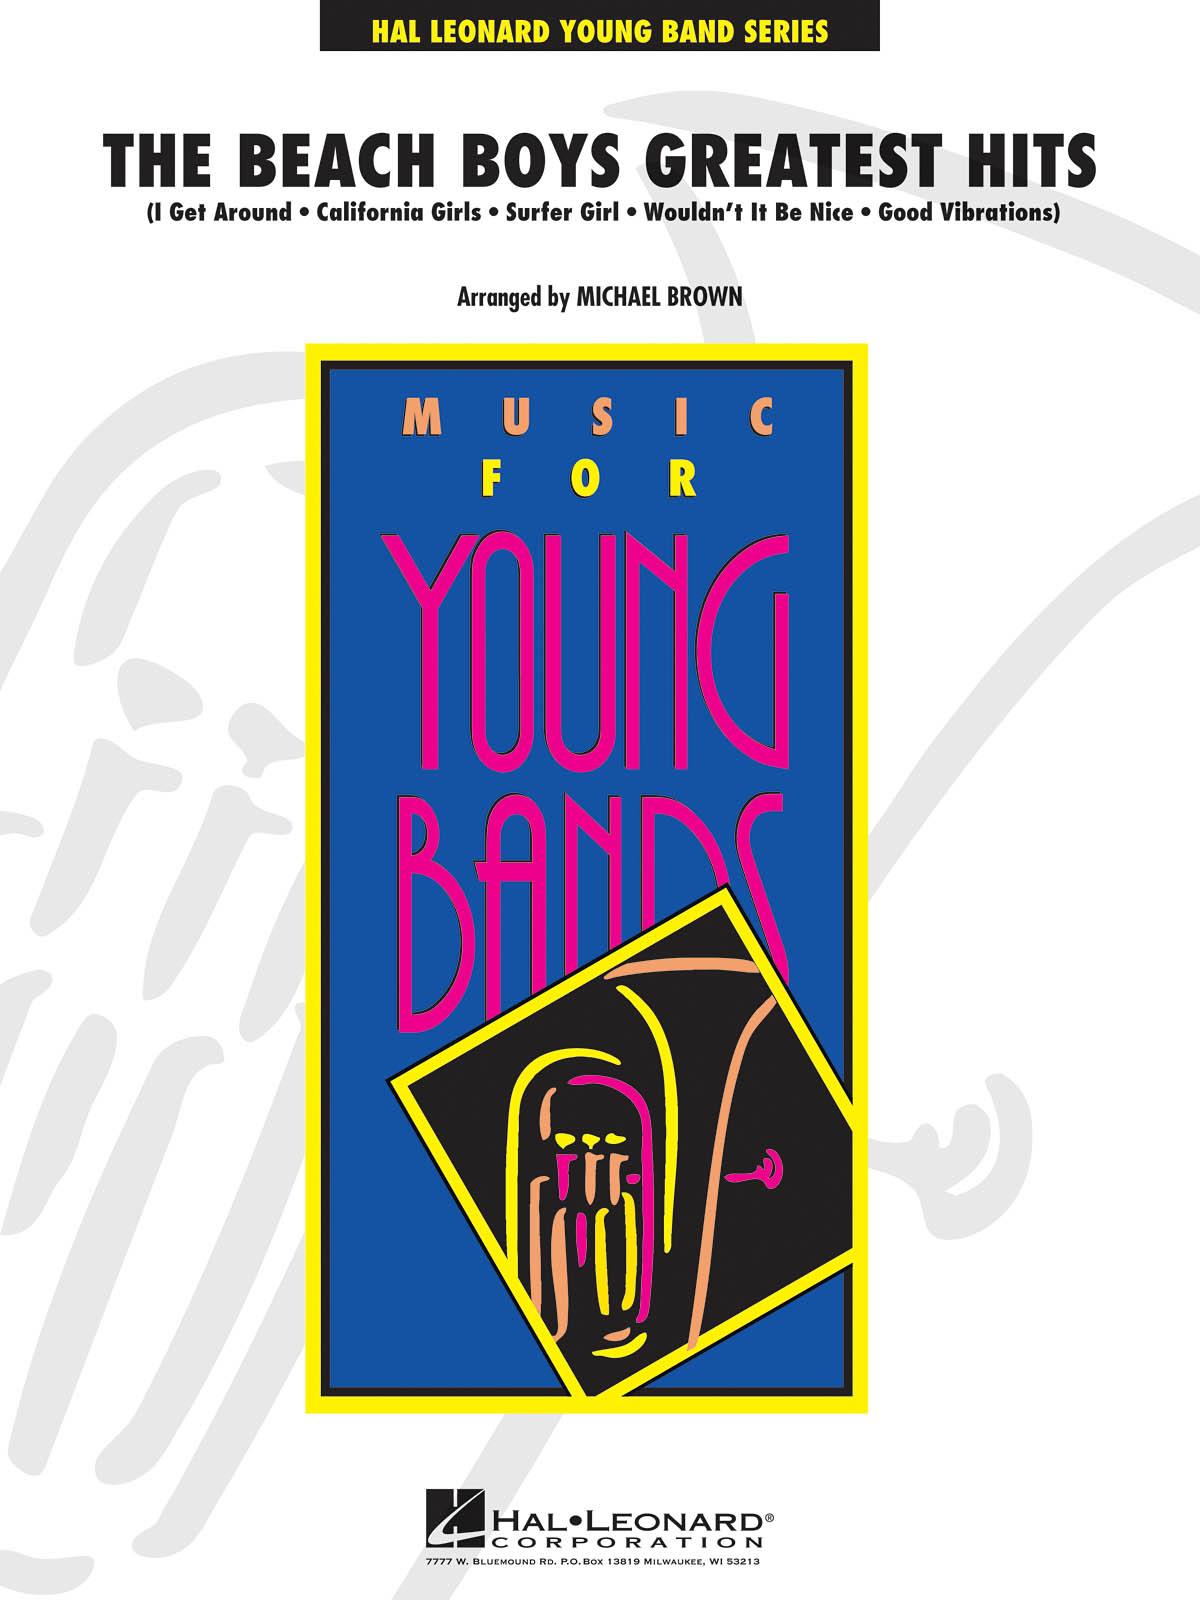 The Beach Boys: The Beach Boys Greatest Hits: Concert Band: Score & Parts